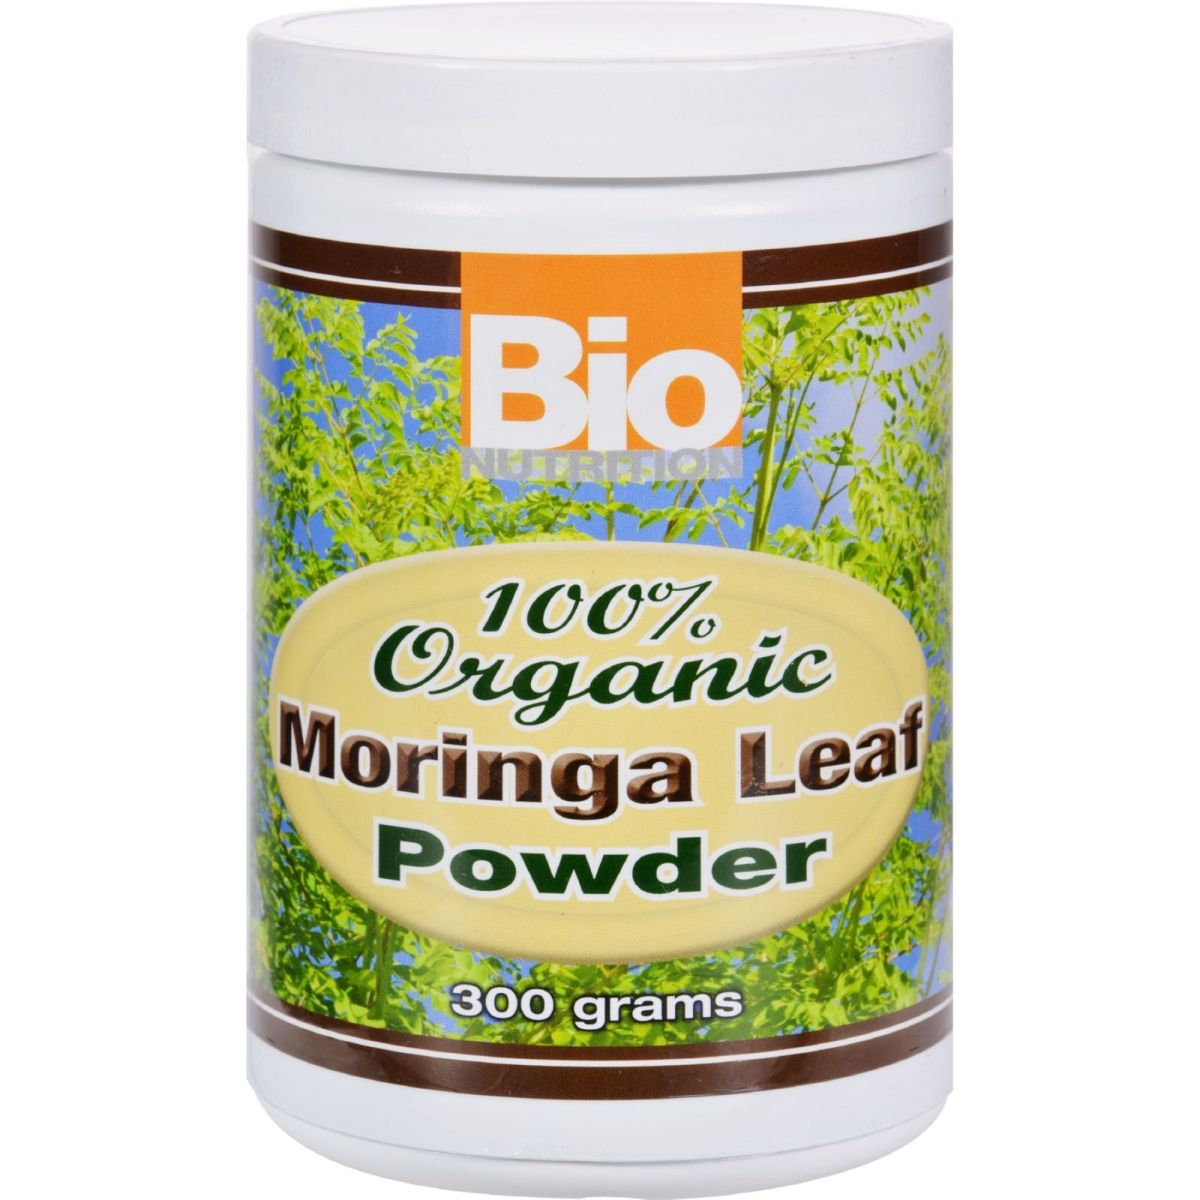 Bio-Nutritional 1576545 300 g Moringa Leaf Powder